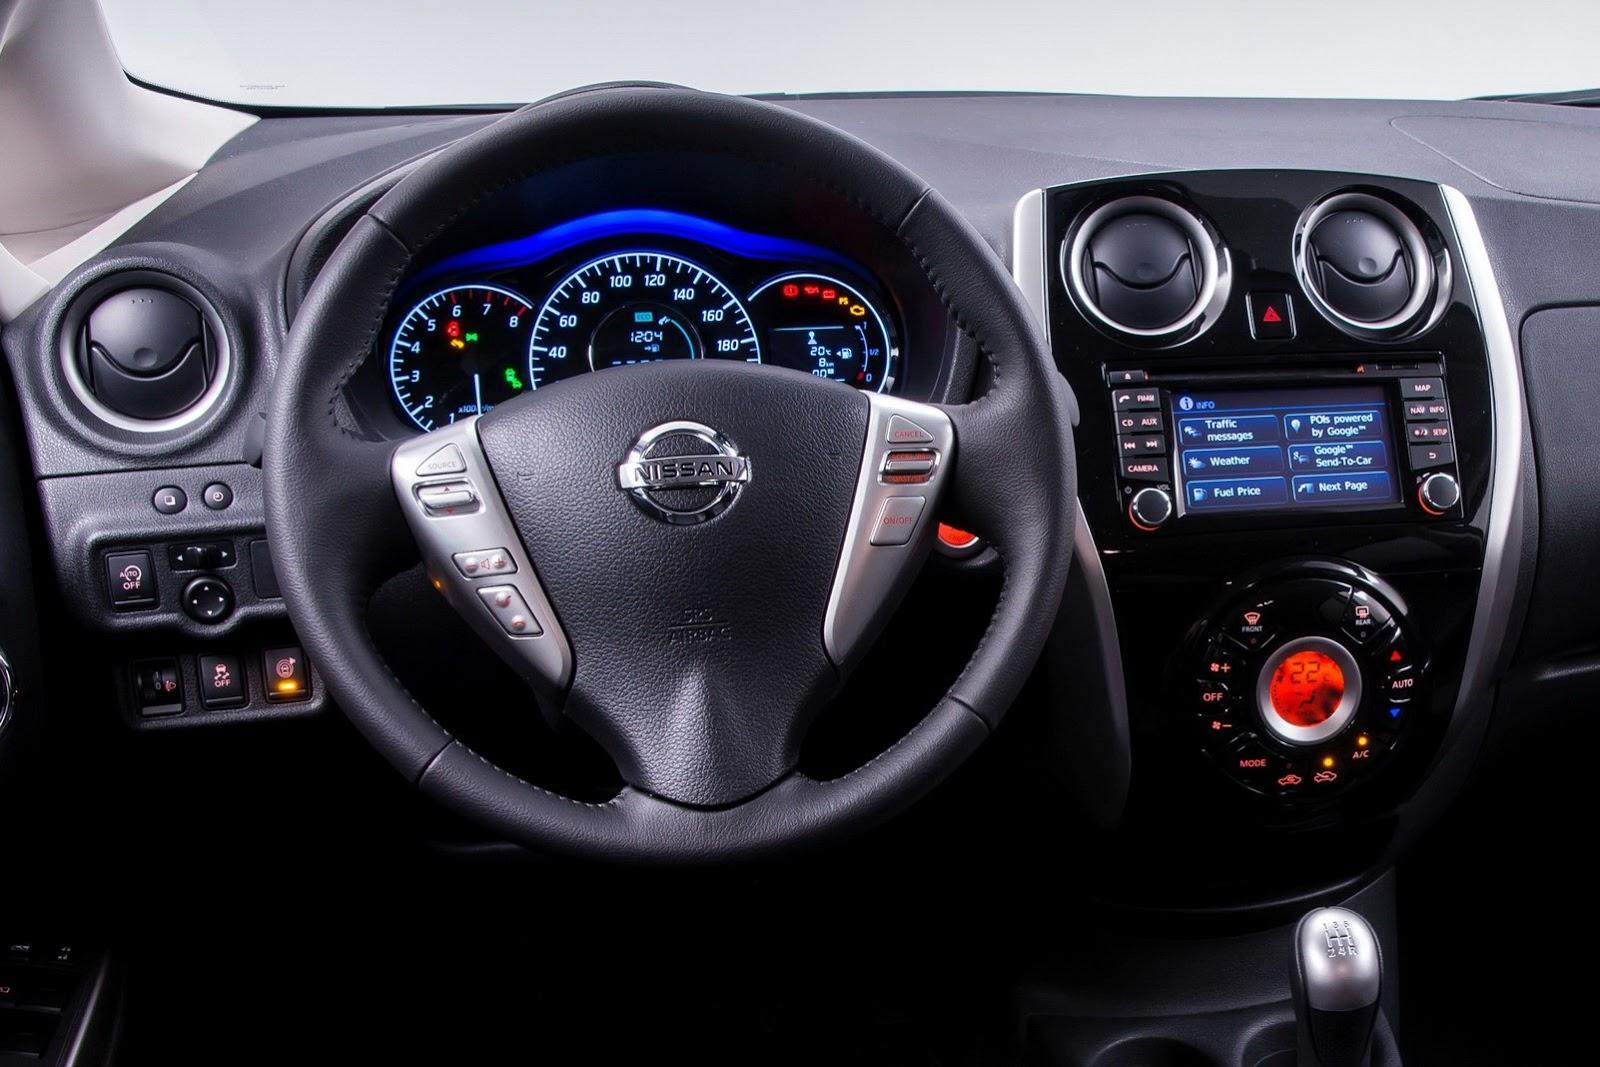 Etiquetas: Nissan , Nissan Note , Nissan Note 2014 , Salón